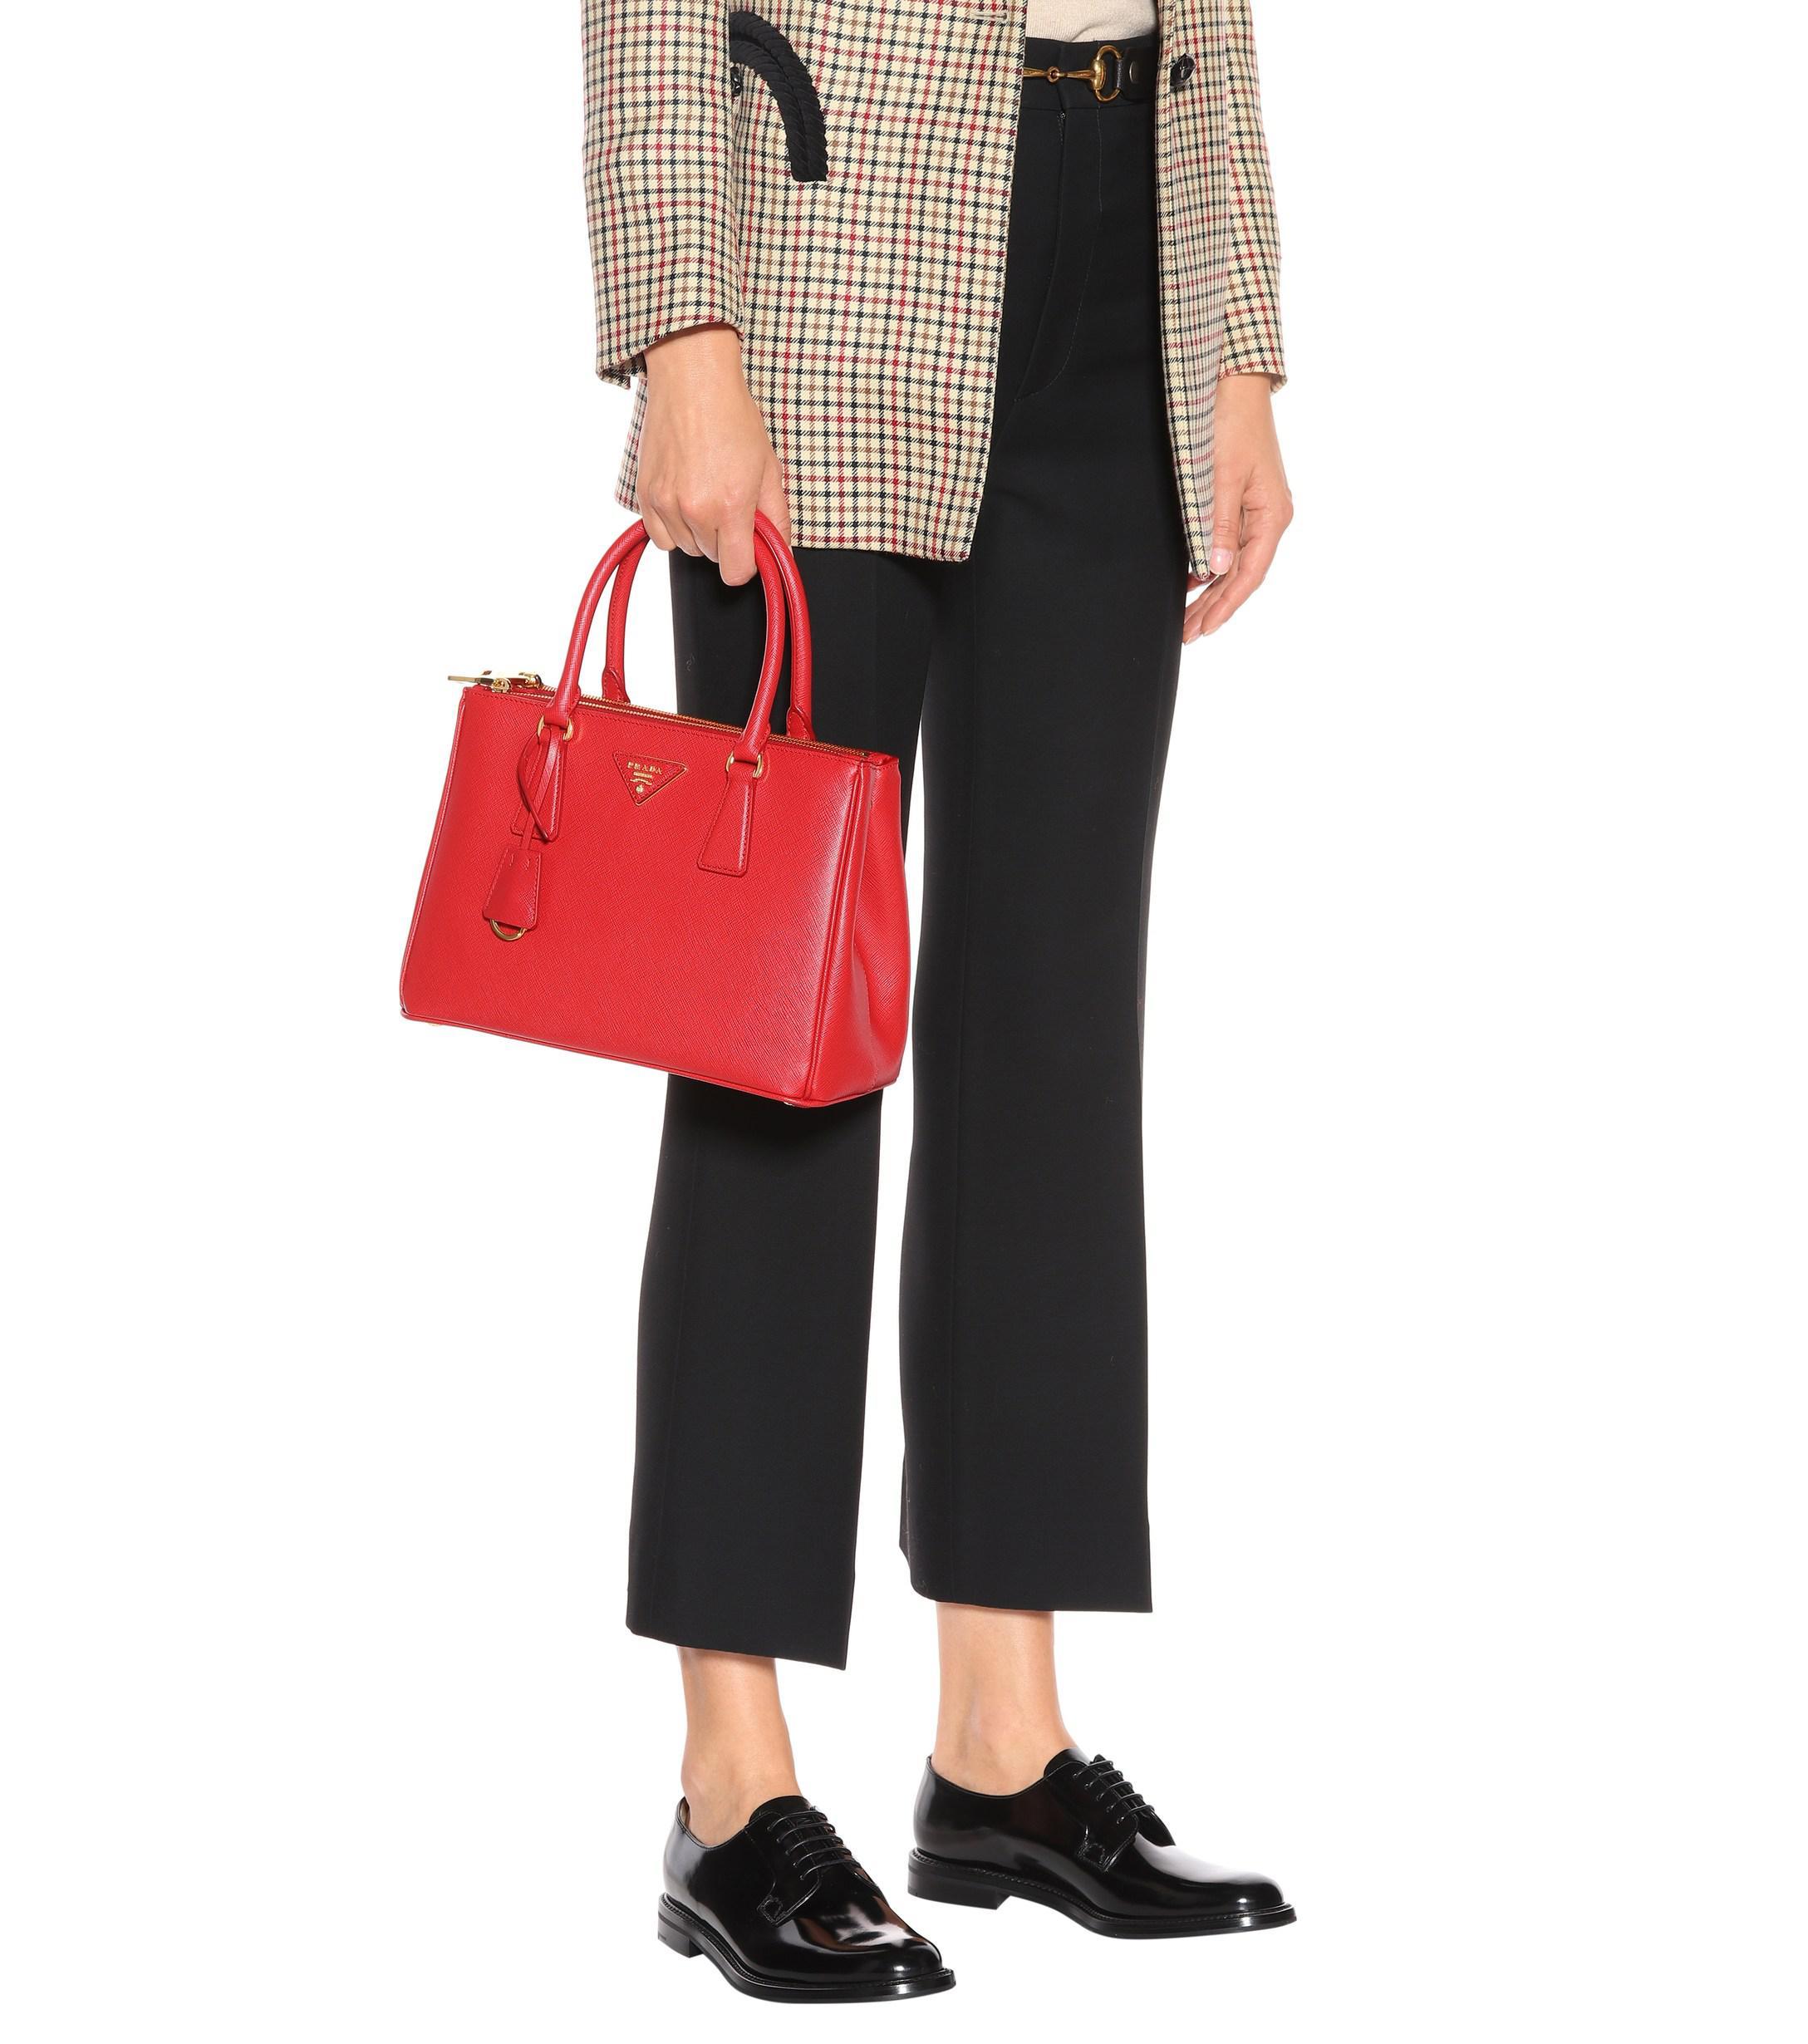 082b62f58dce Lyst - Prada Galleria Saffiano Small Leather Shoulder Bag in Red